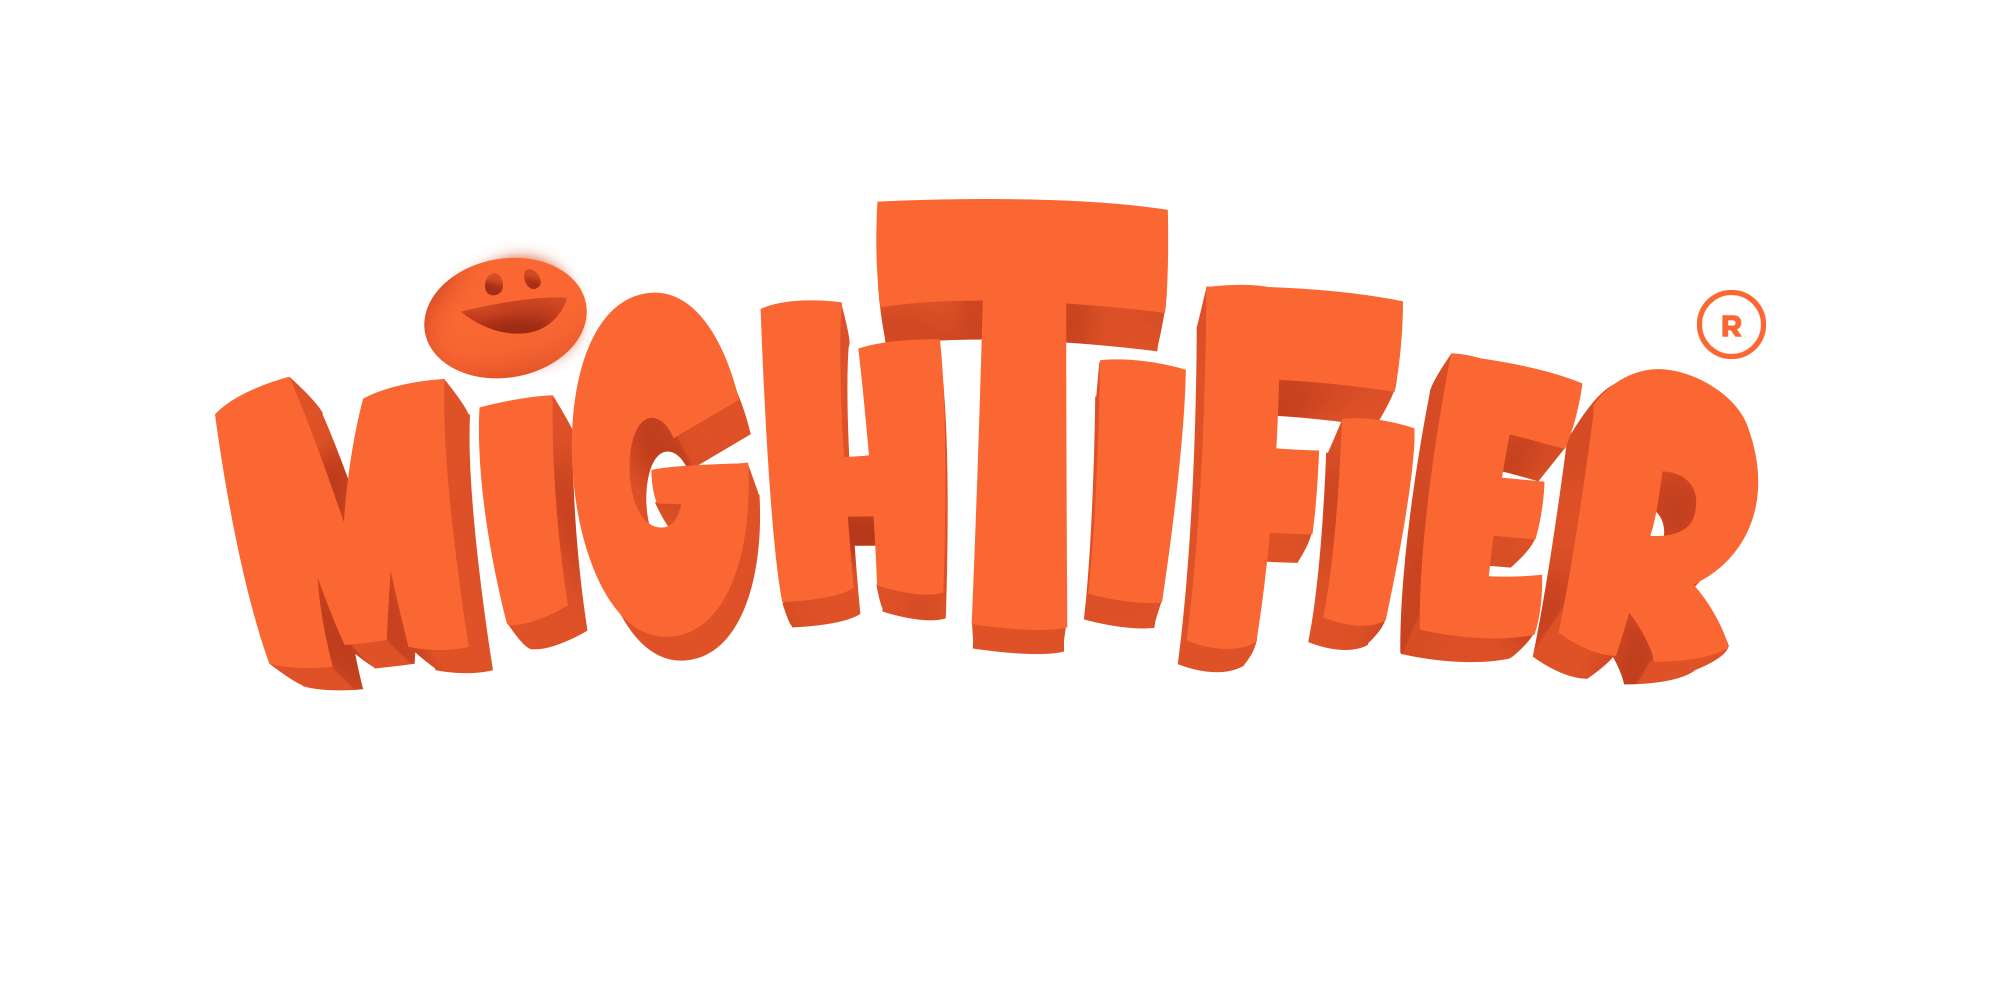 MIghtifier_orange.png